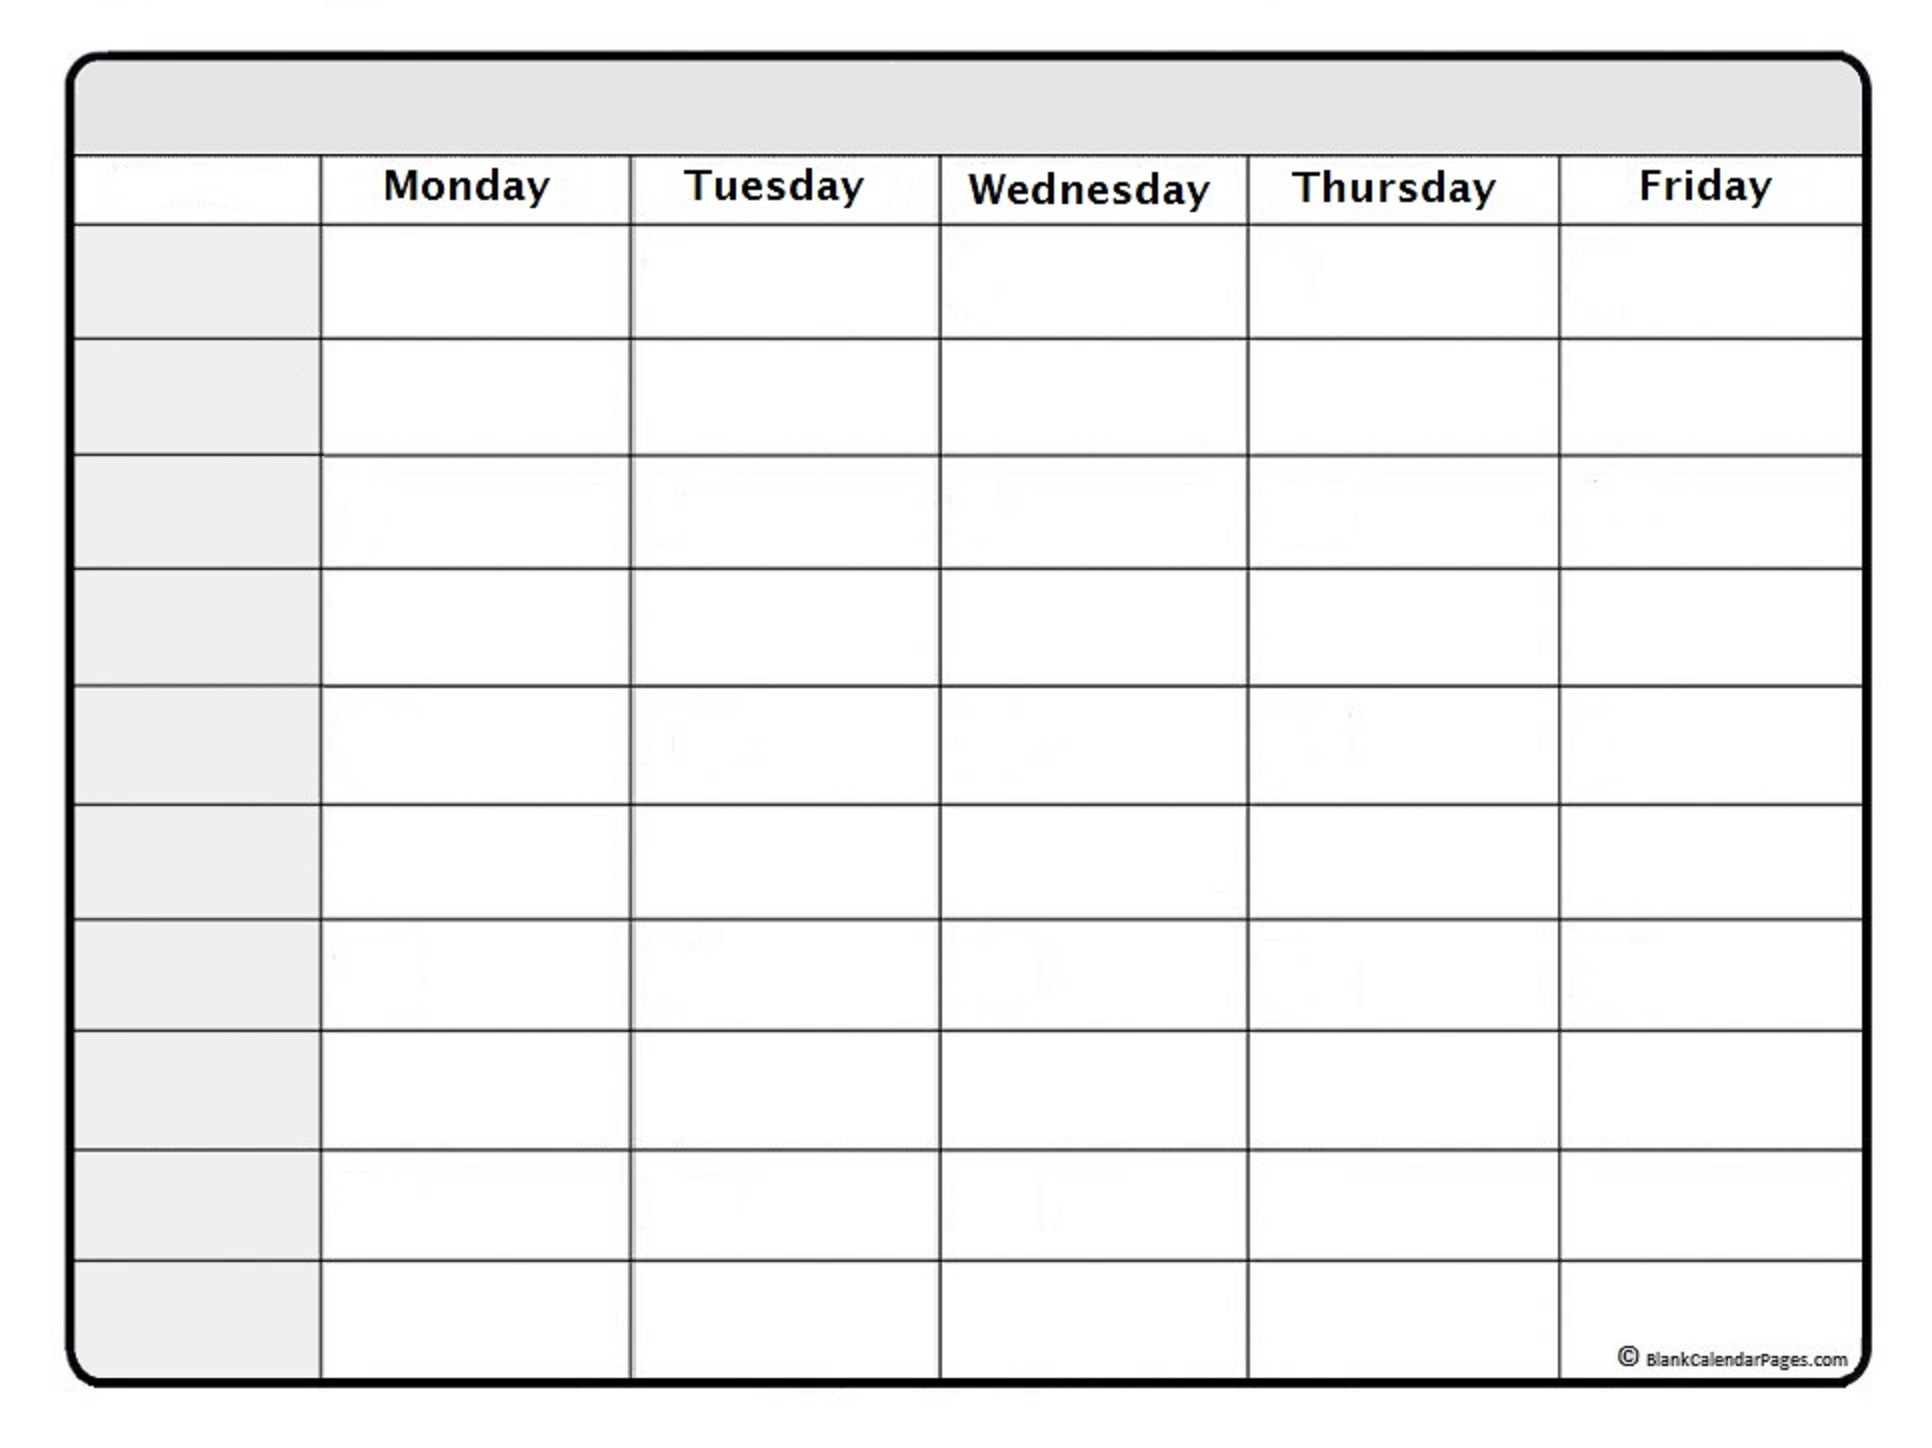 Calendar Blank Picture